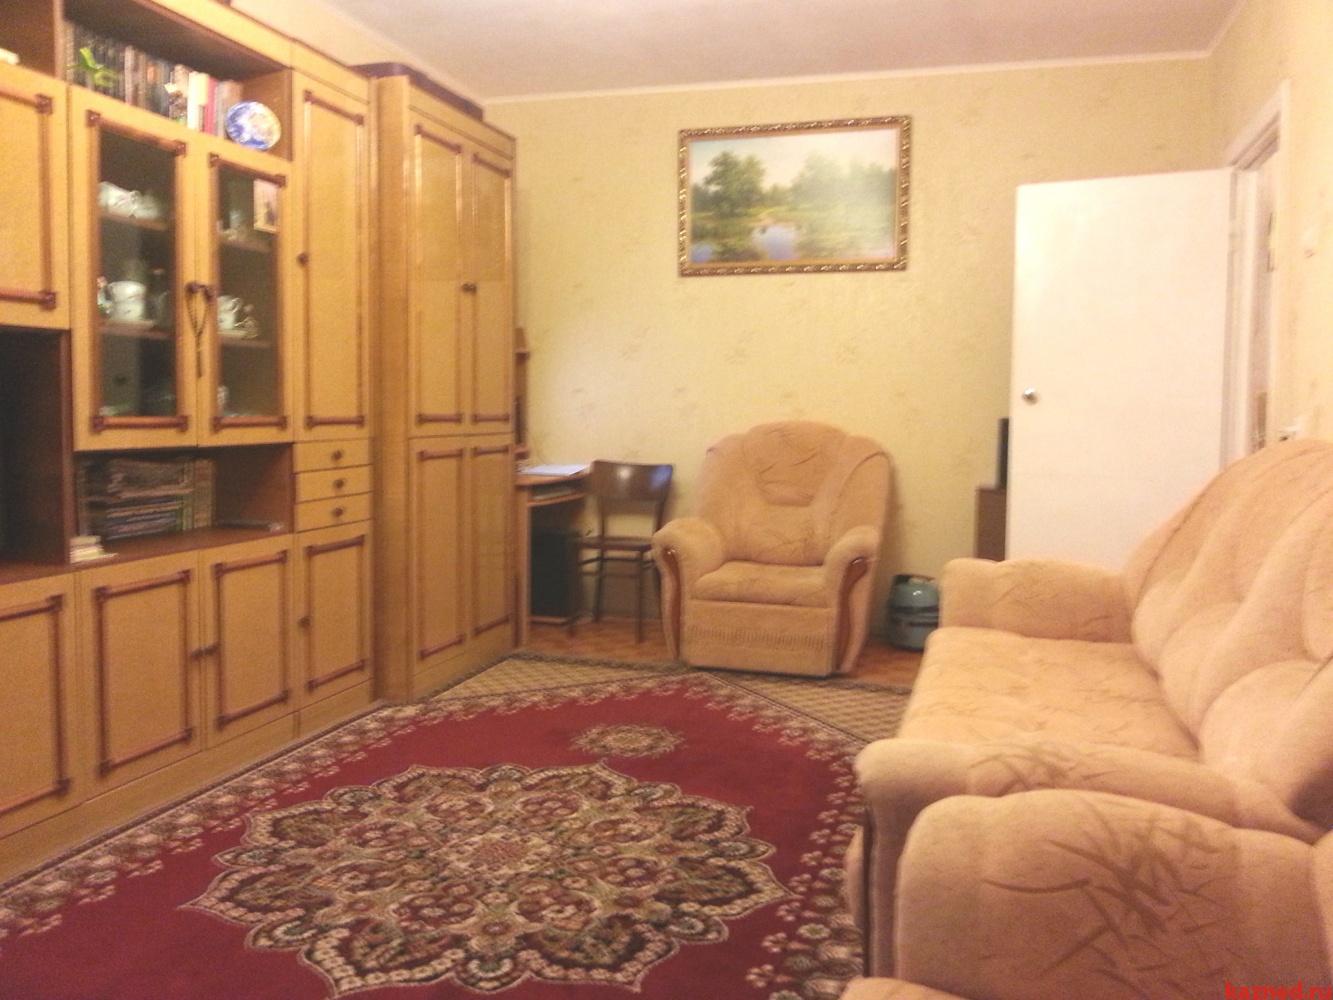 Продажа 2-к квартиры Фучика, 16, 53 м2  (миниатюра №2)